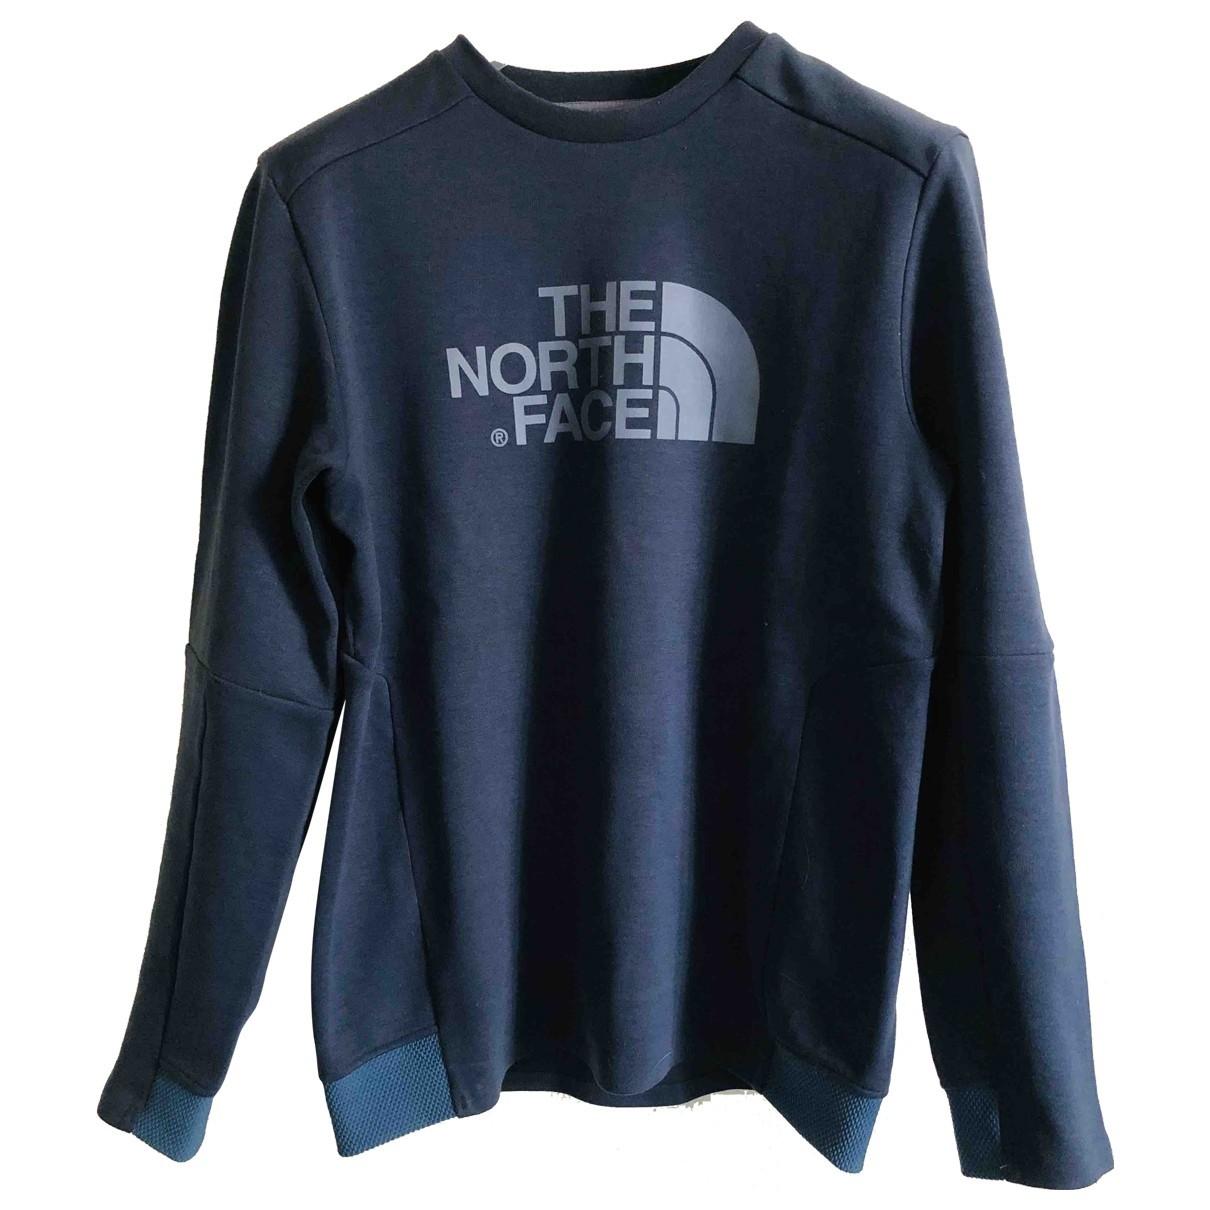 The North Face \N Blue Knitwear & Sweatshirts for Men S International